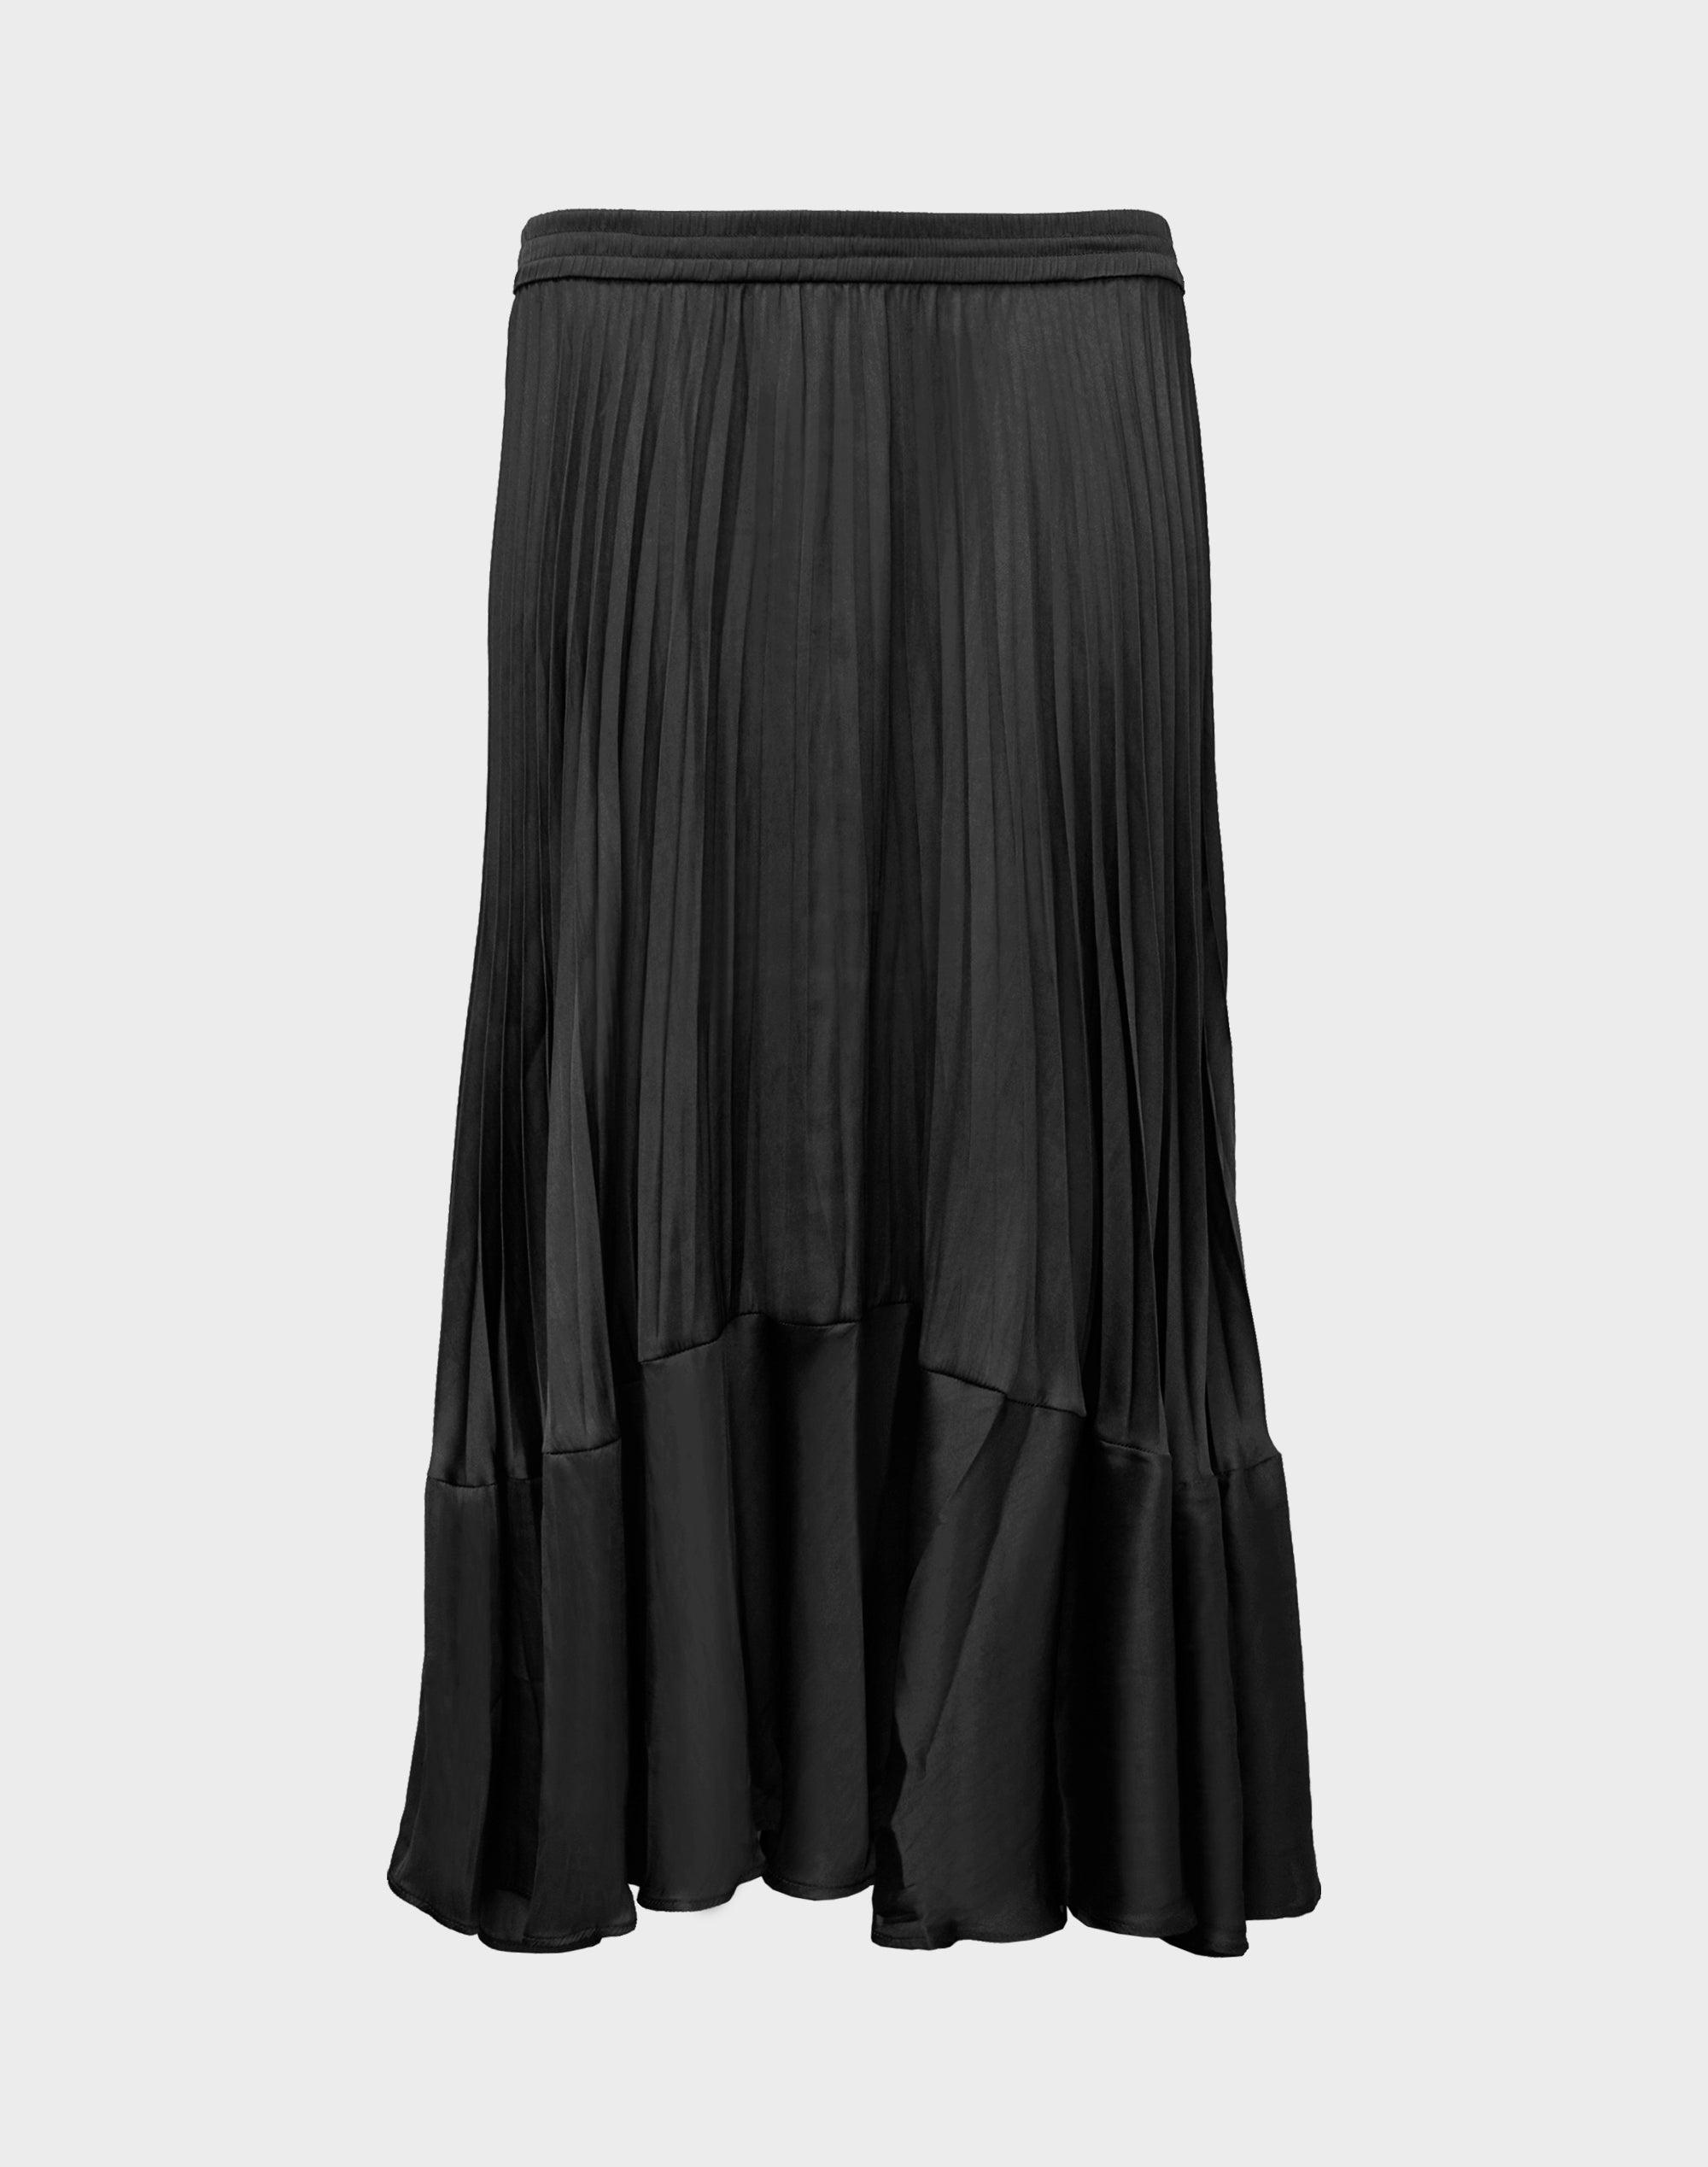 Westbay Pleated Satin Skirt